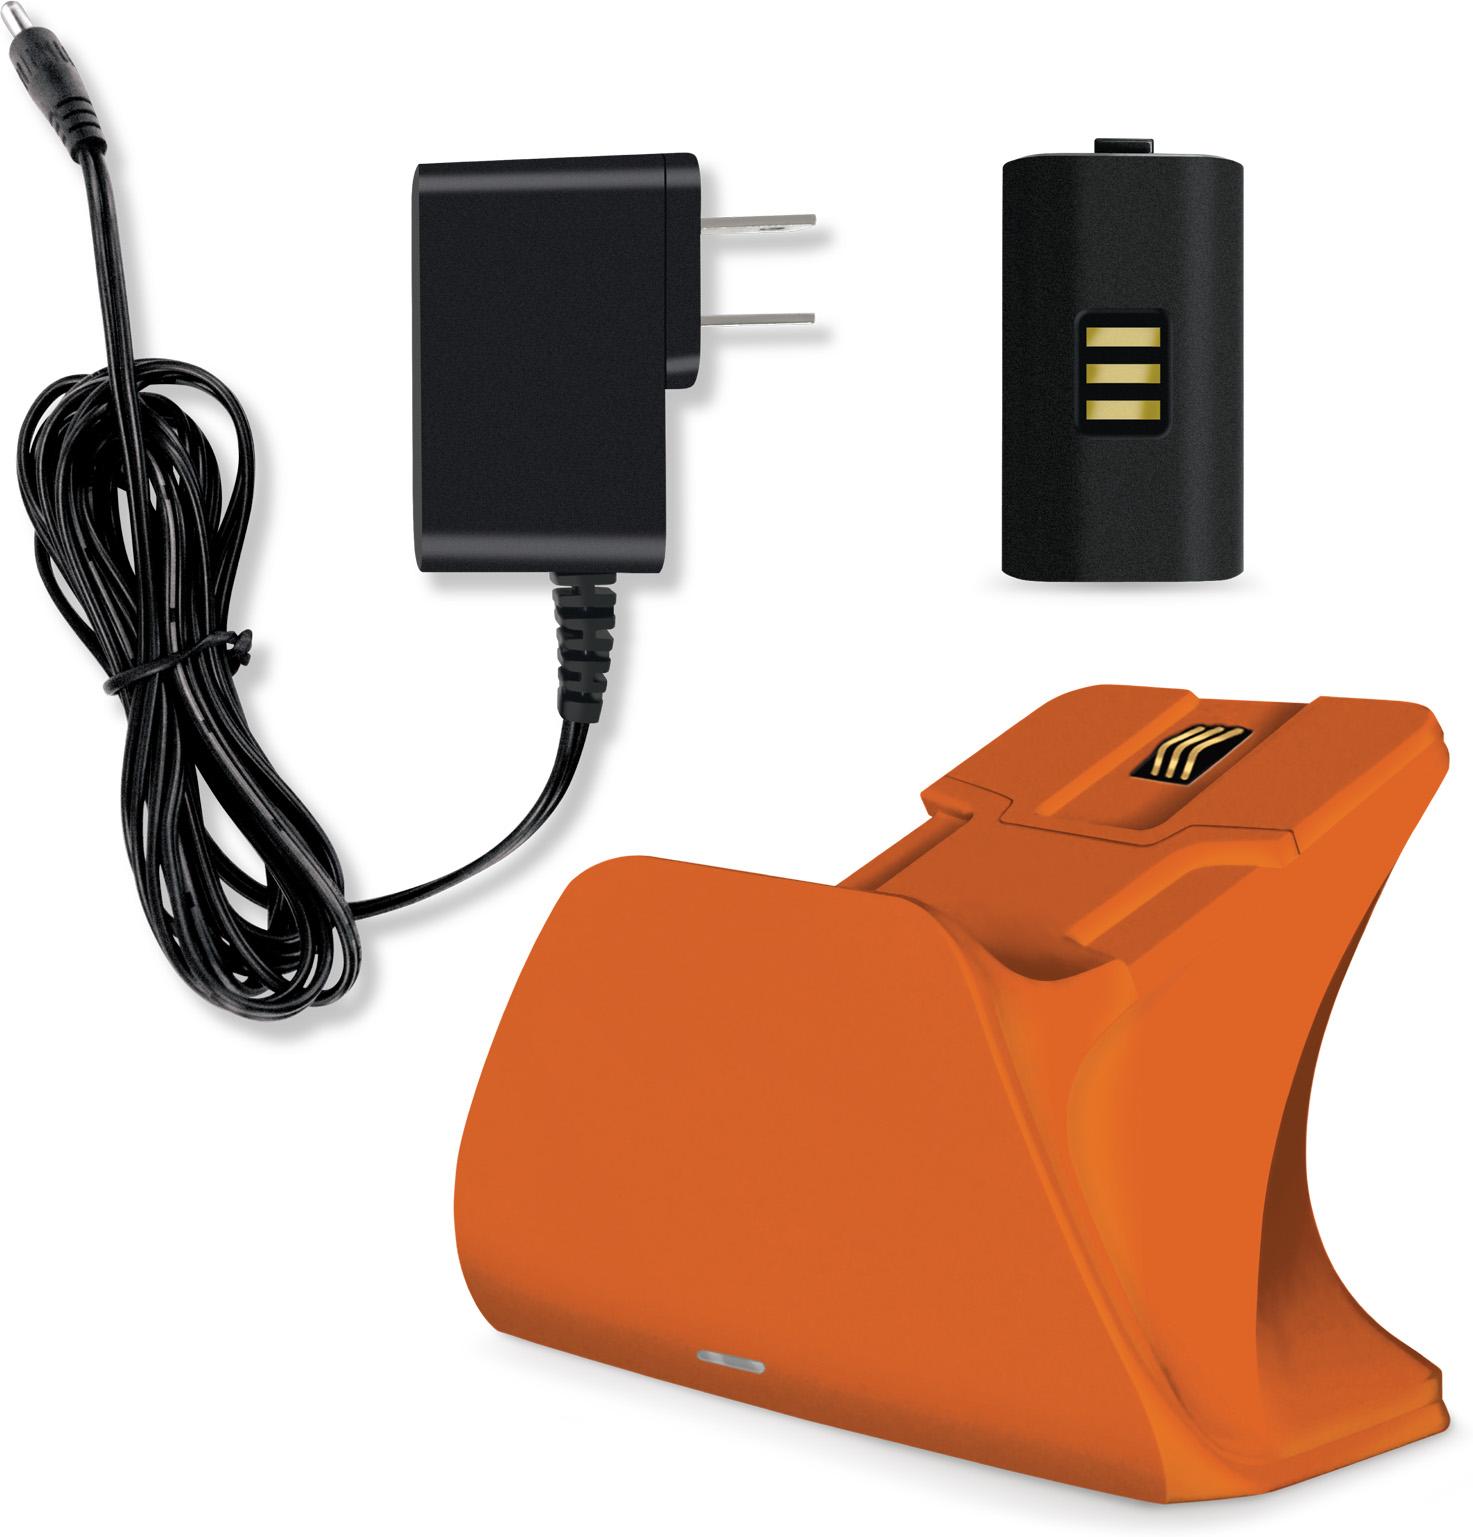 RW5frG?ver=c2d1 - Controller Gear Xbox Design Lab Pro Charging Stand (Zest Orange)